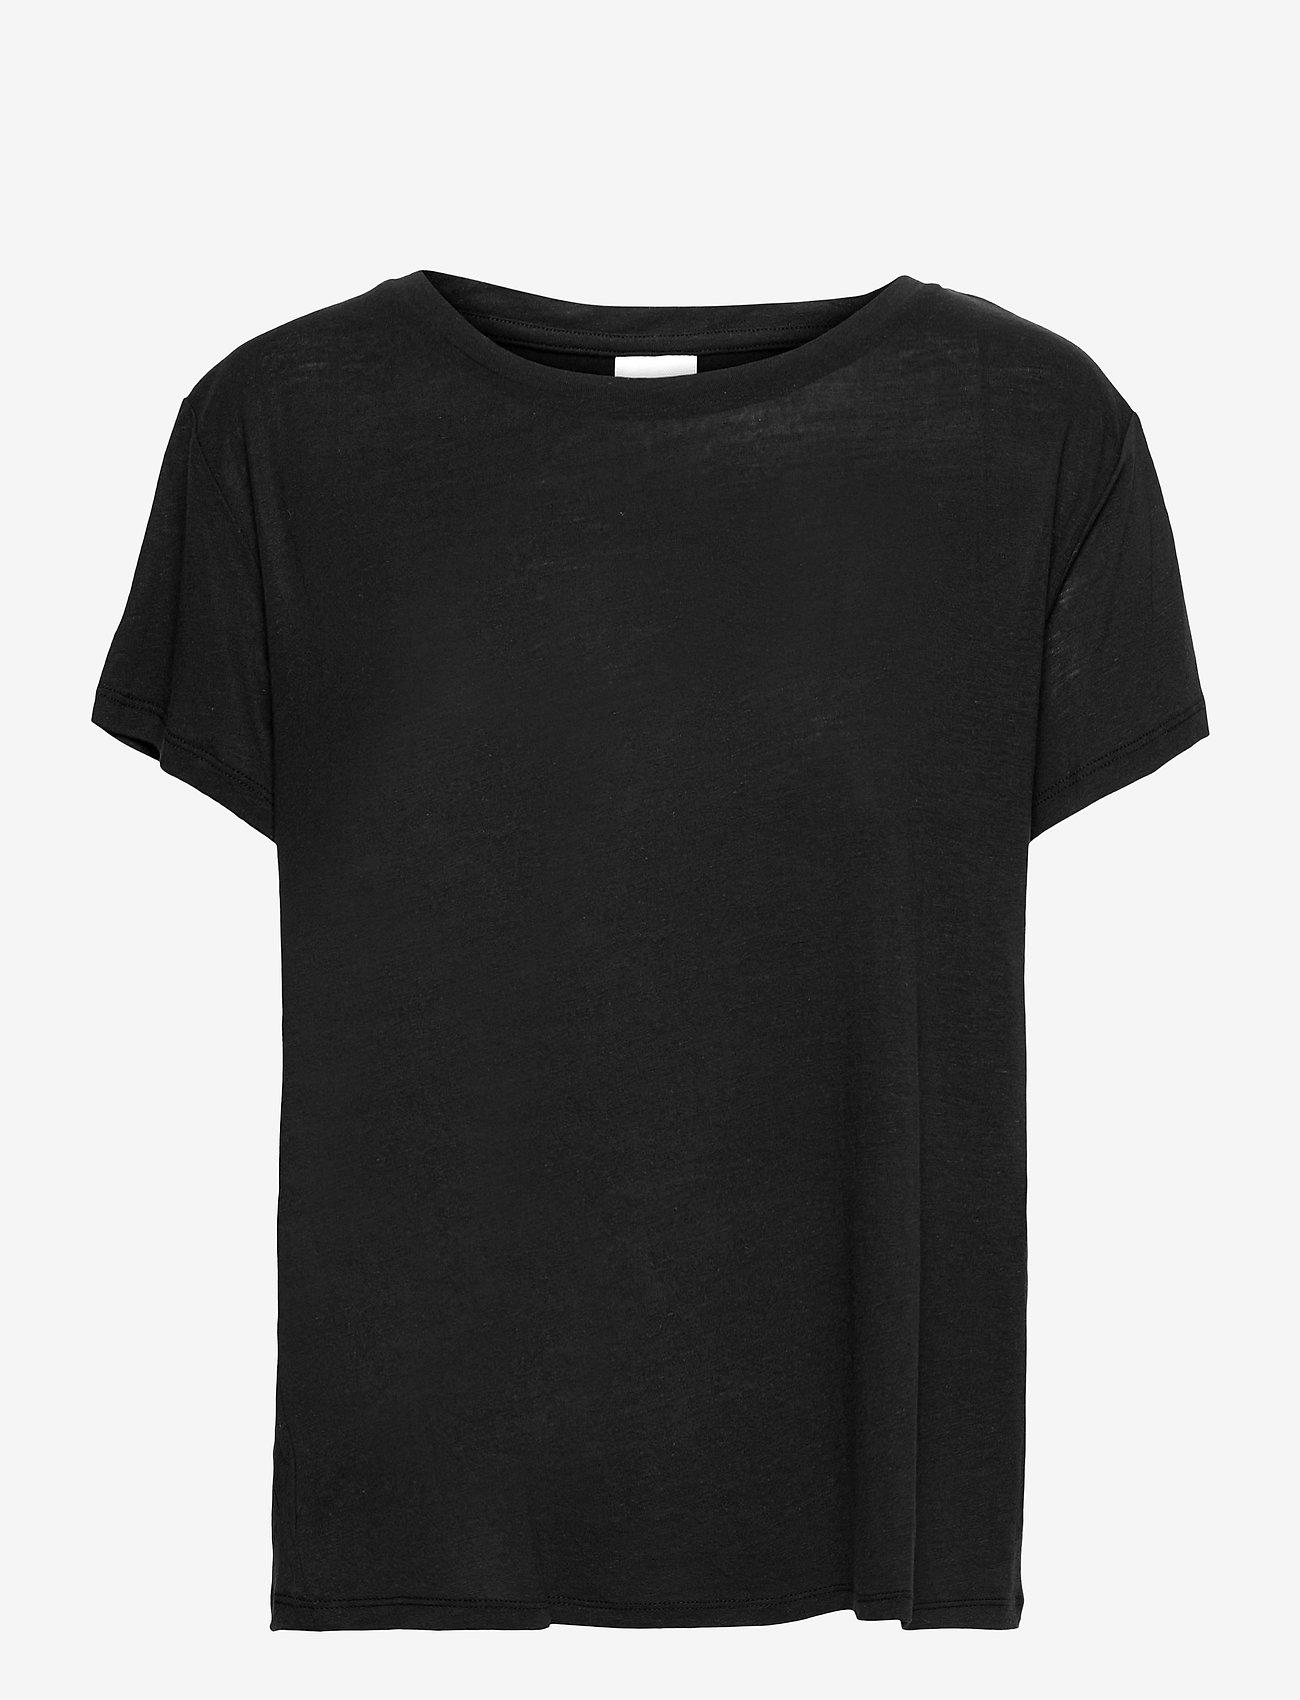 Varley - Tilden Tee 2.0 - t-shirts - black - 0